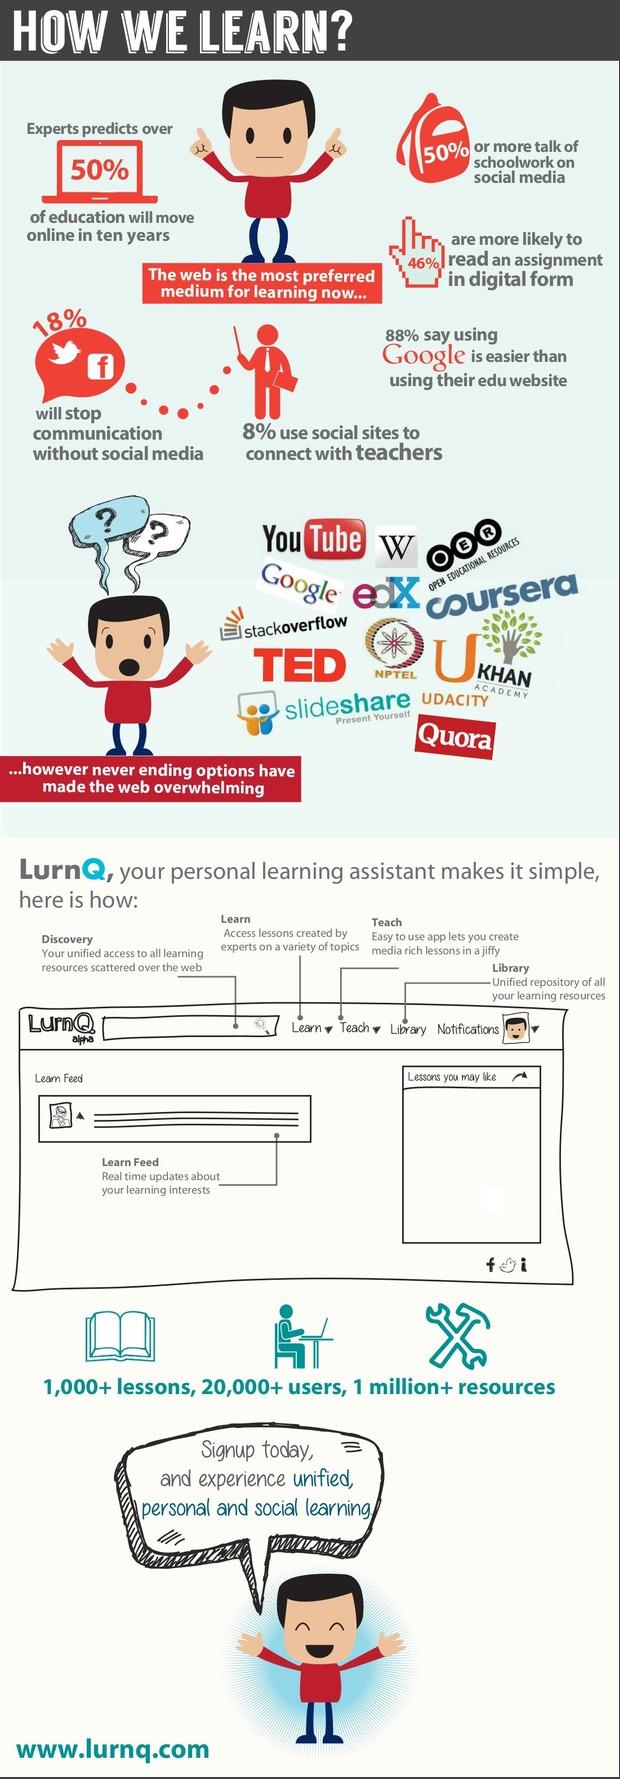 LurnQ infographic